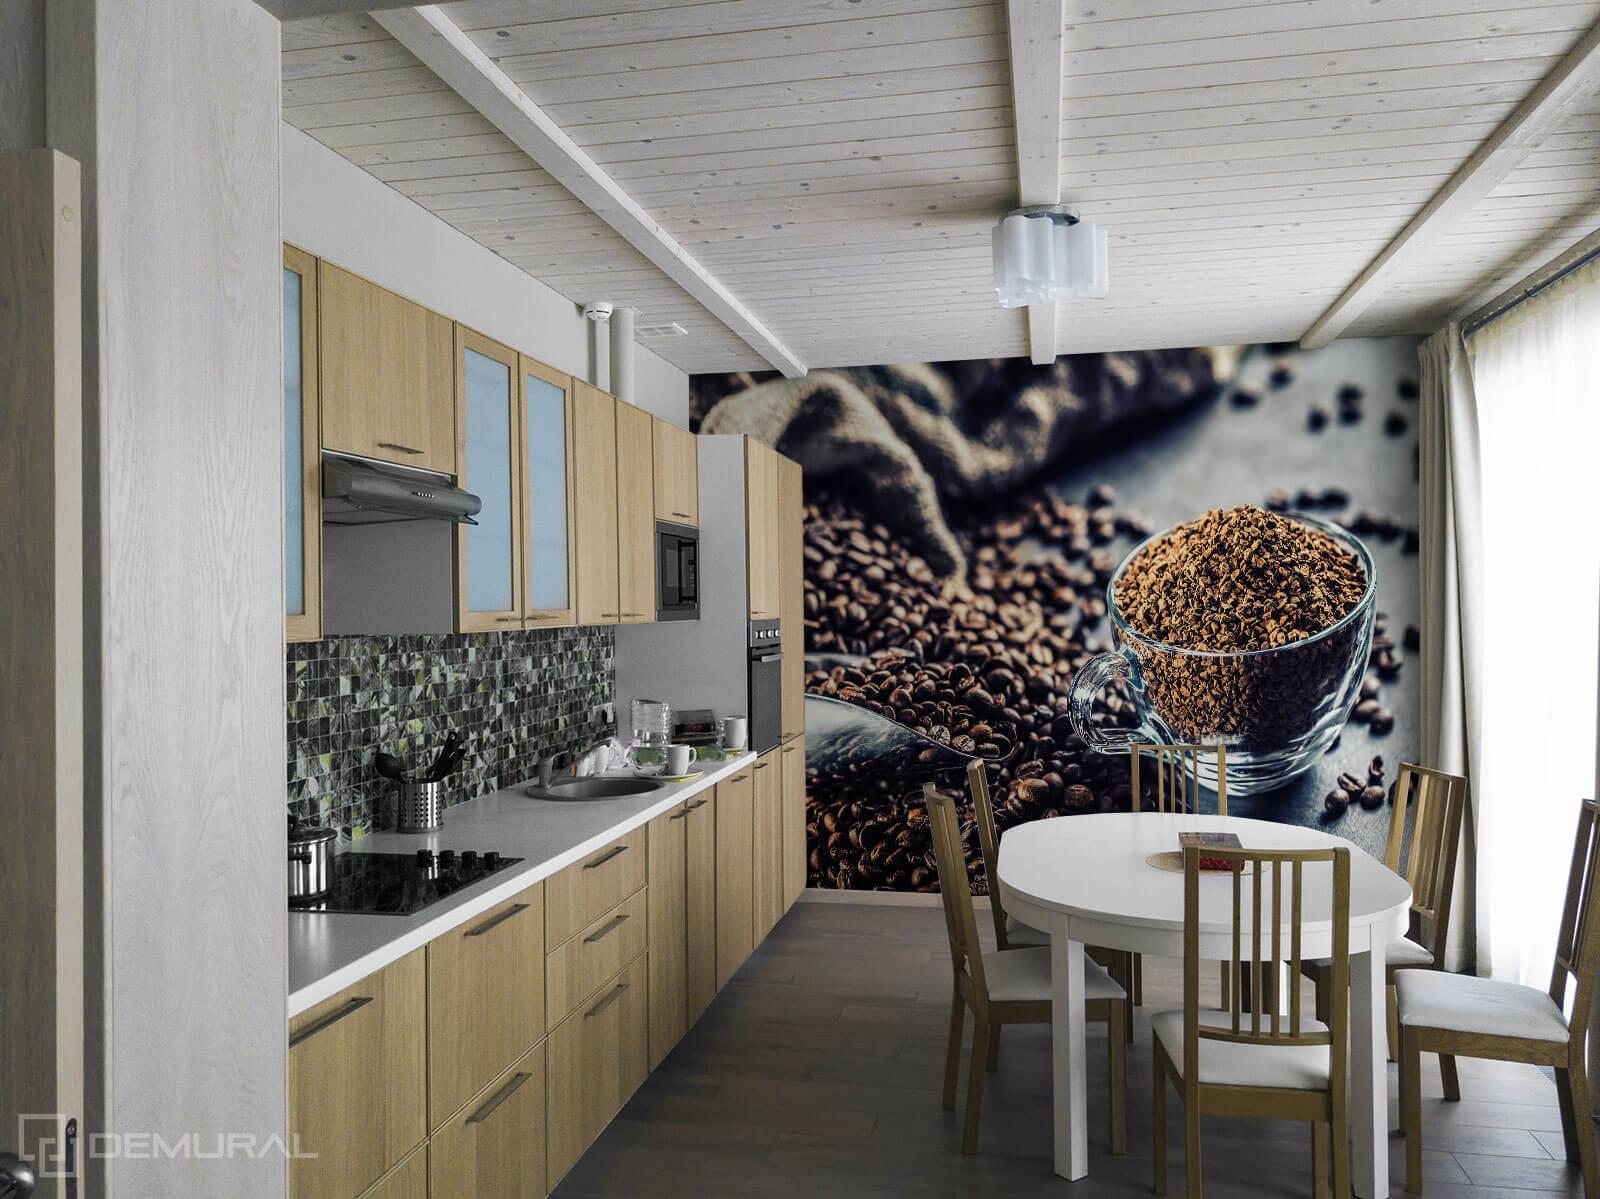 Photo wallpaper Coffee Aroma - Photo wallpaper in big kitchen - Demural